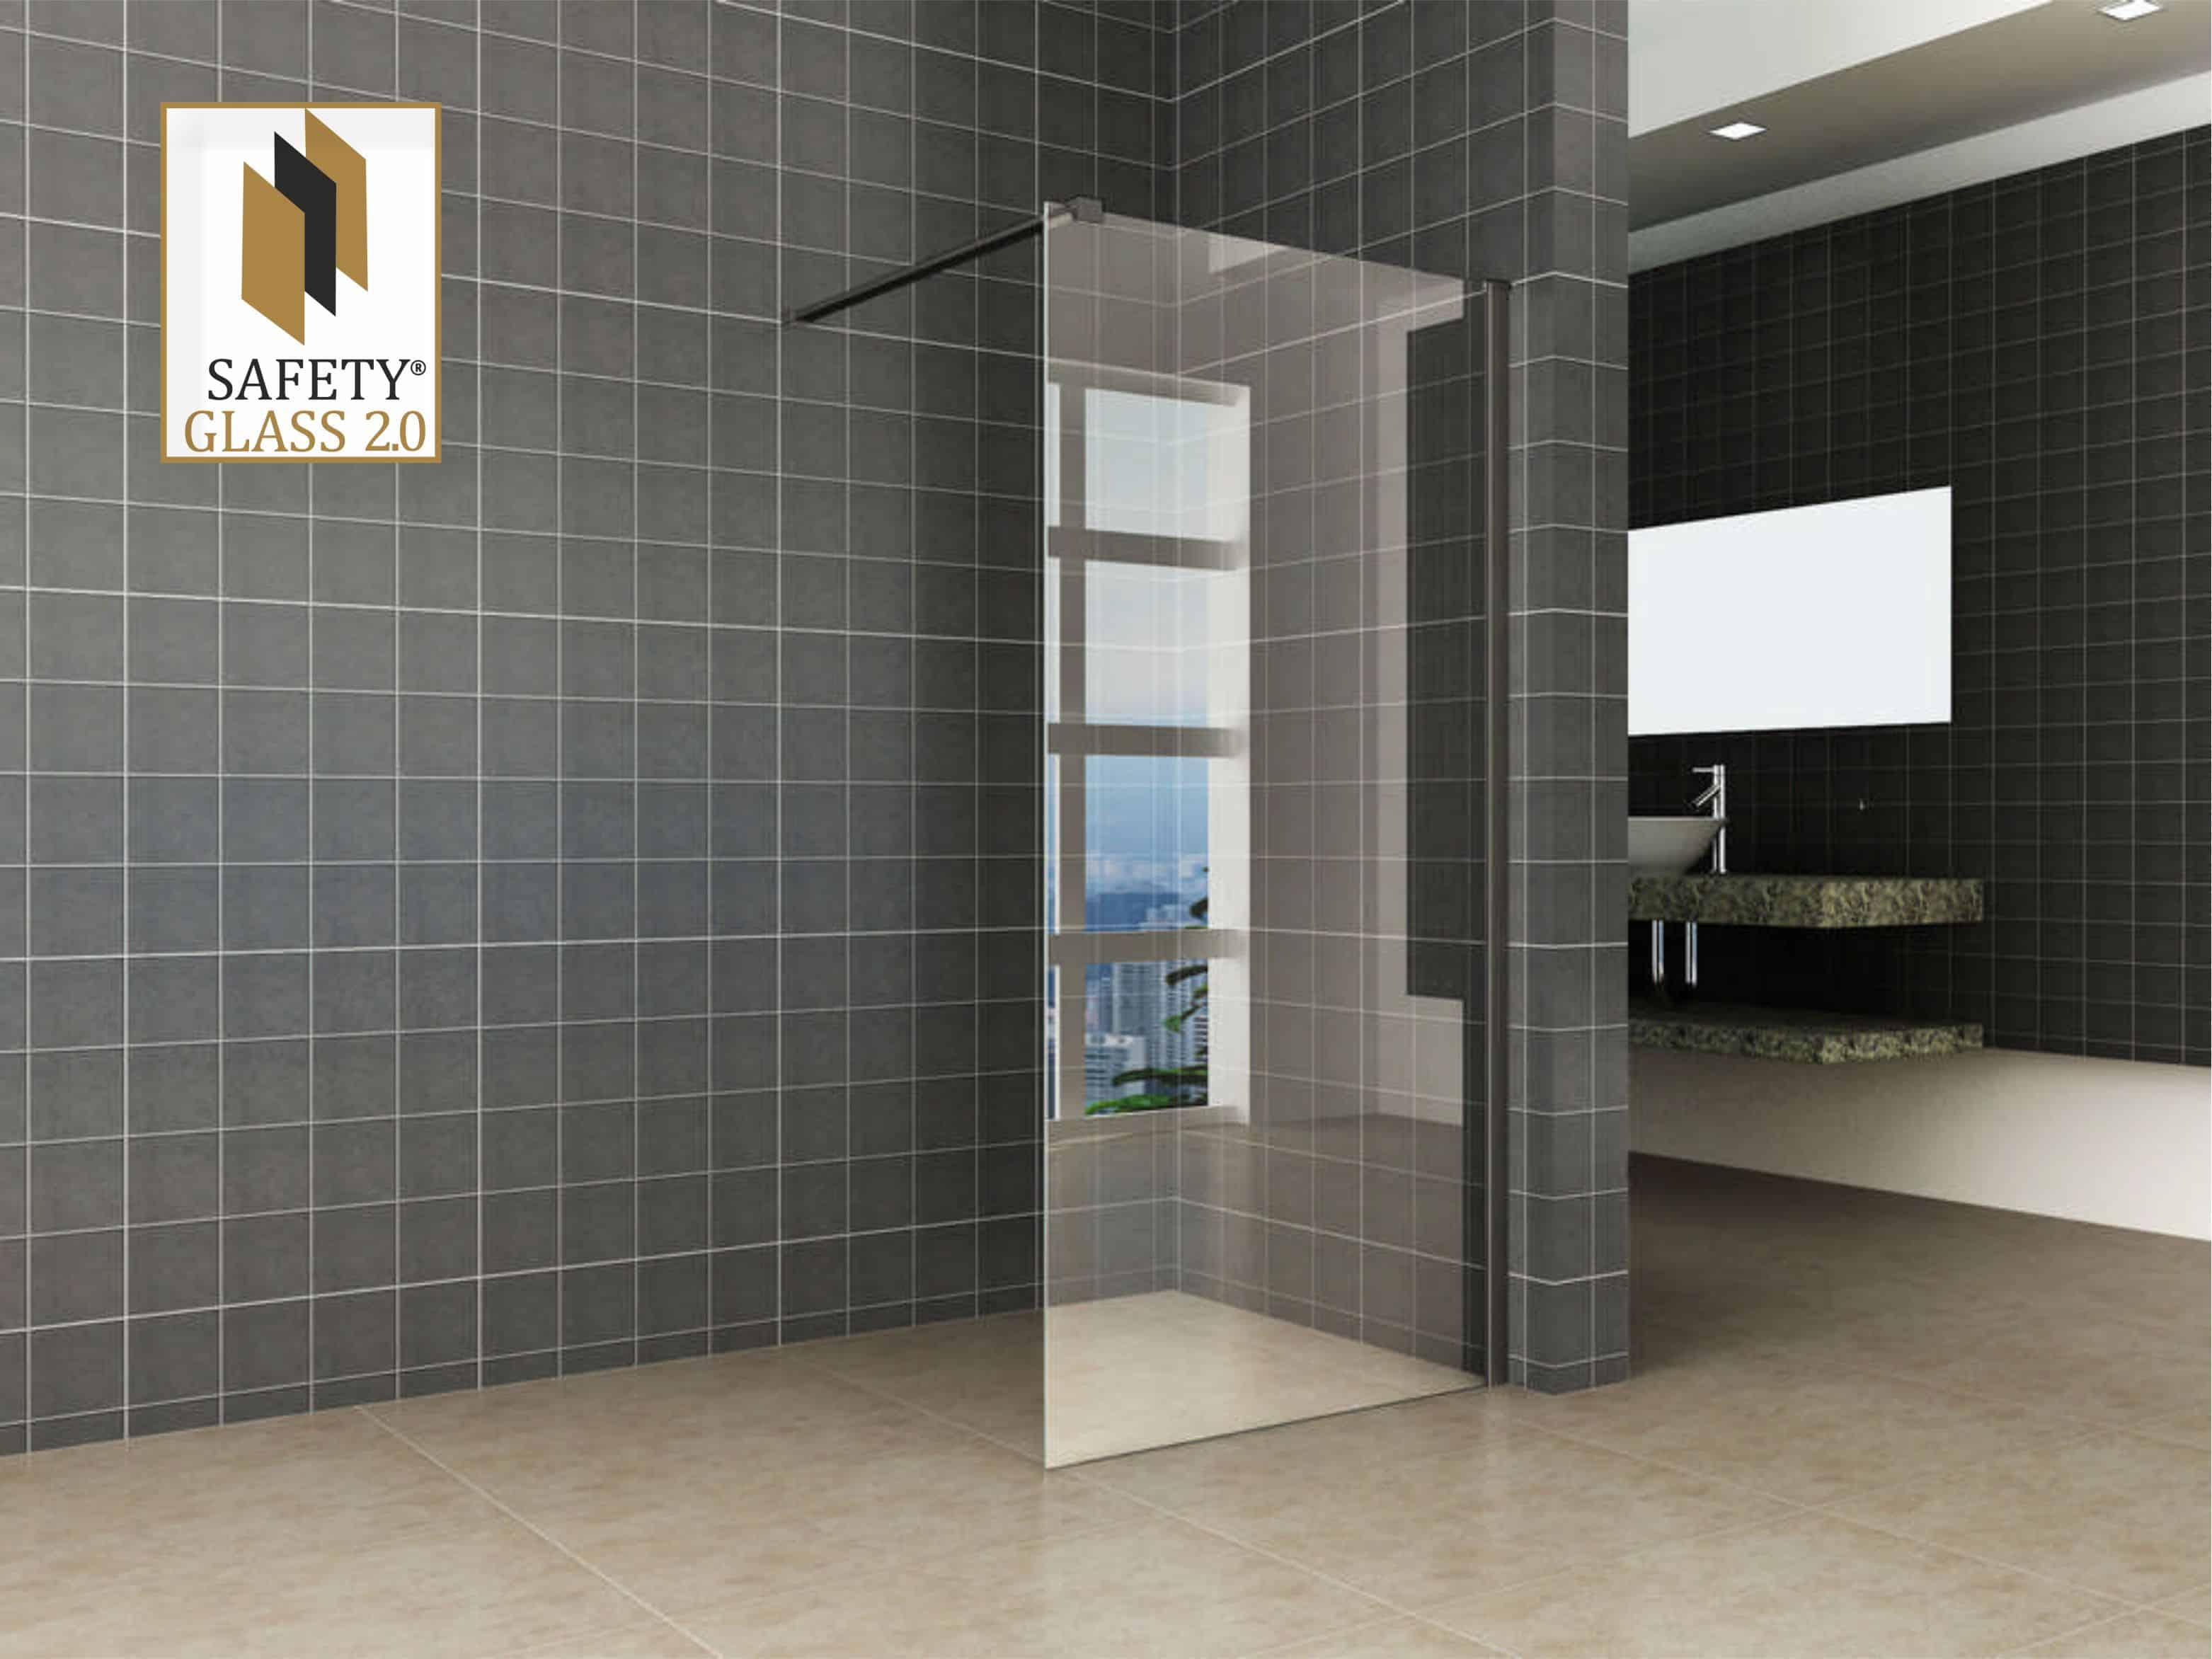 Inloopdouche Met Douchecabine : Inloopdouche safety glass met zwarte profielen sanitairkiezer